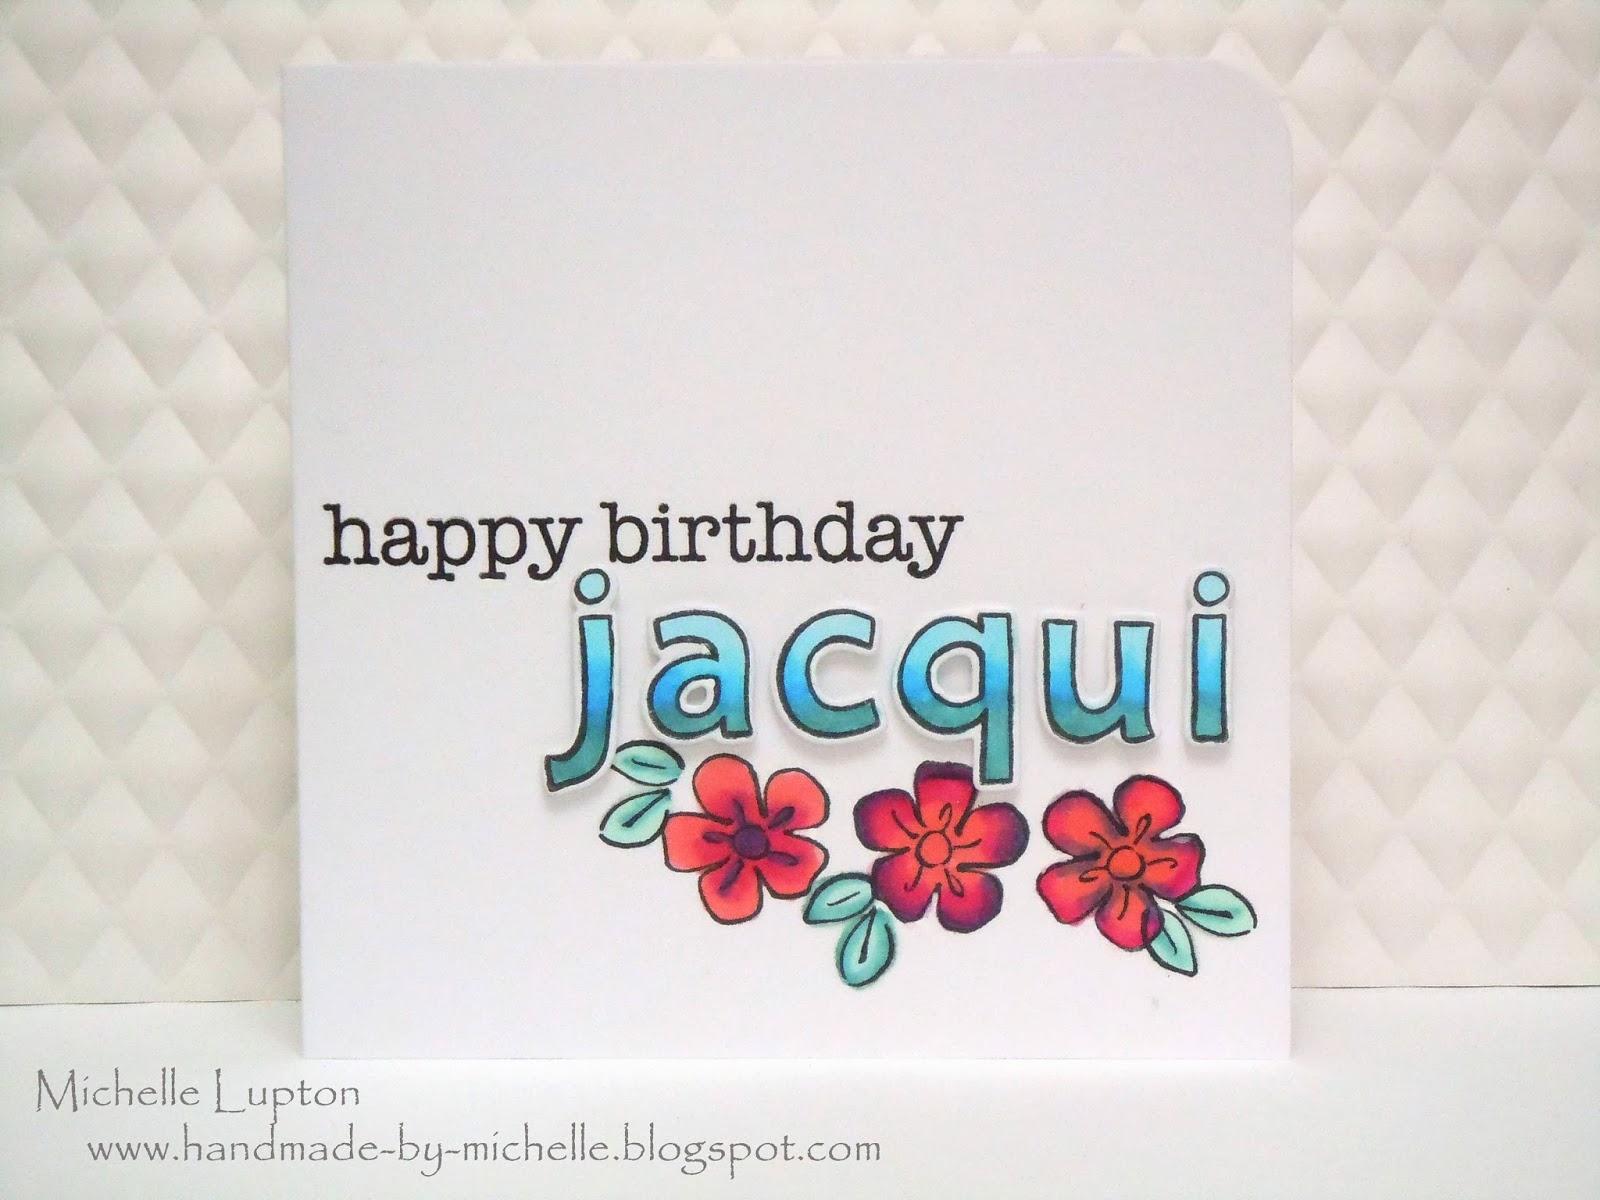 Handmade By Michelle Happy Birthday Jacqui